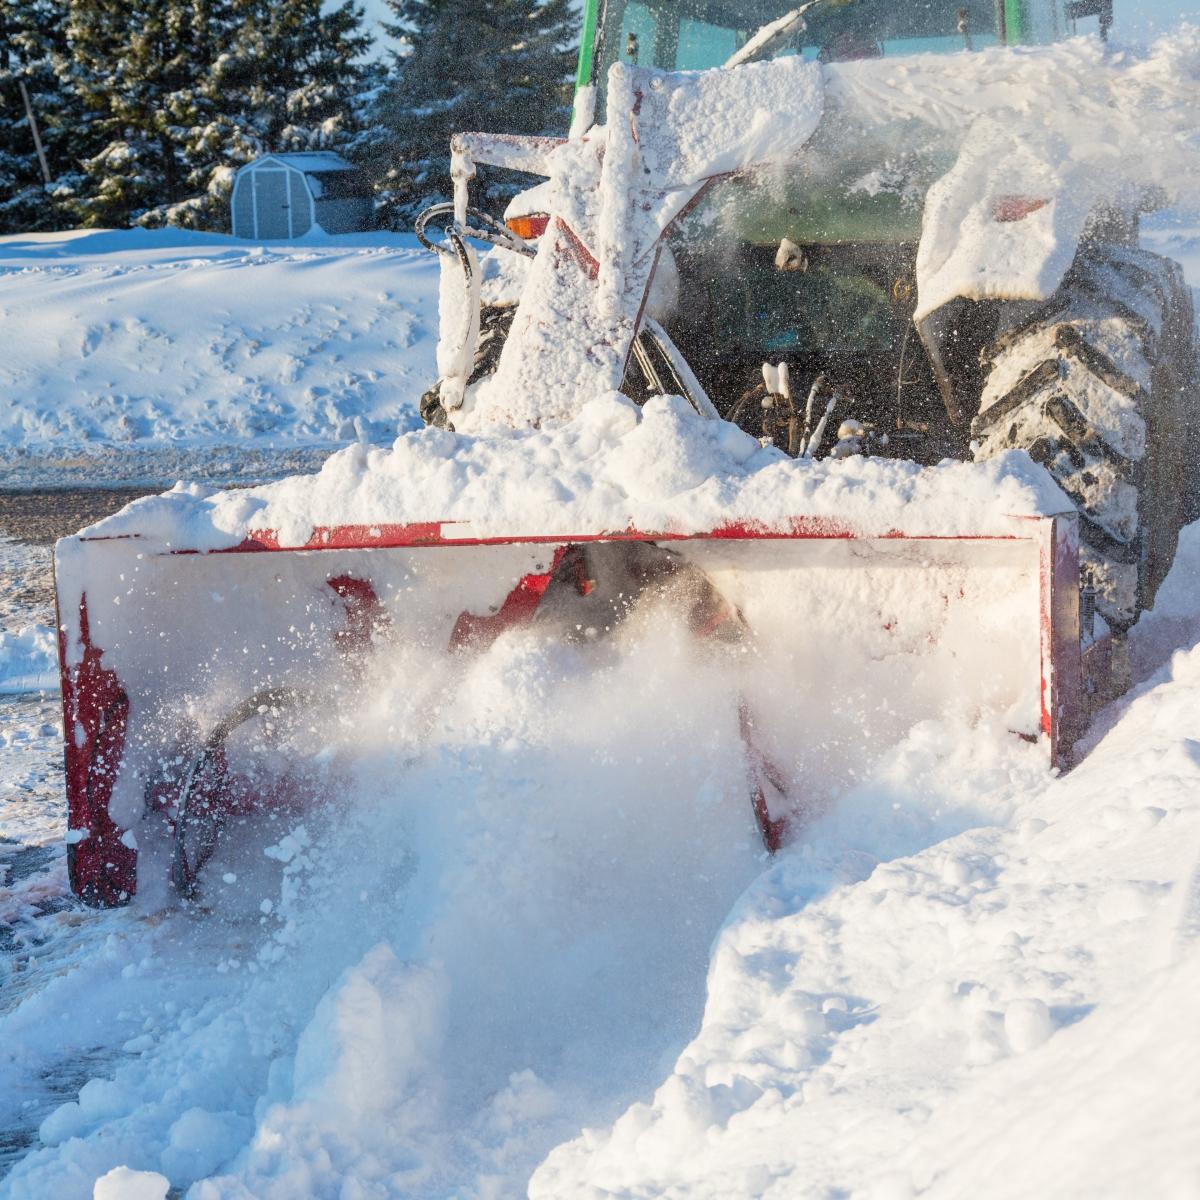 commercial snow removal in cheyenne www.cheyennehauling.com